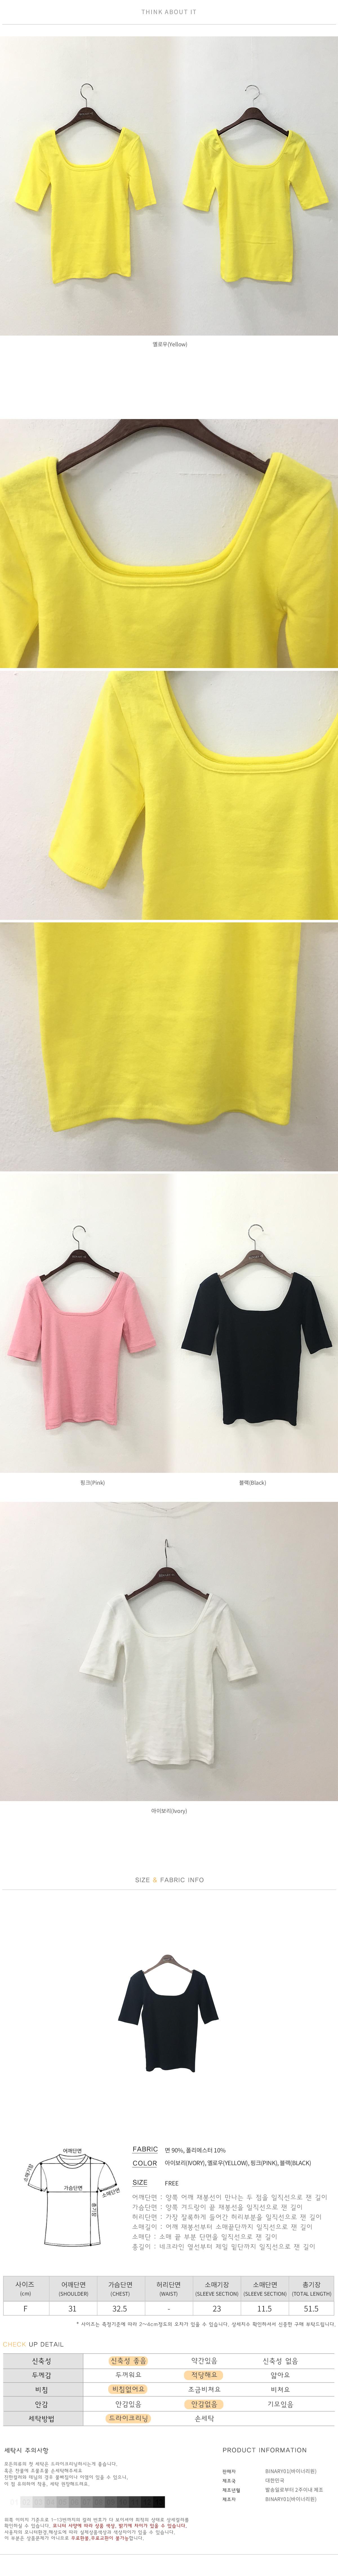 Square Finger T-shirt